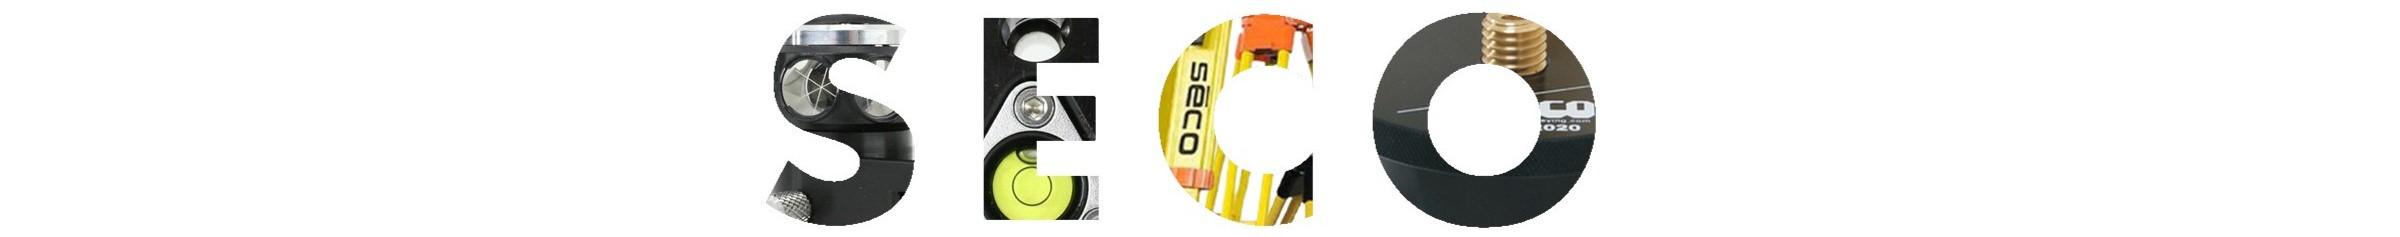 seco-strip-testing-2.jpg